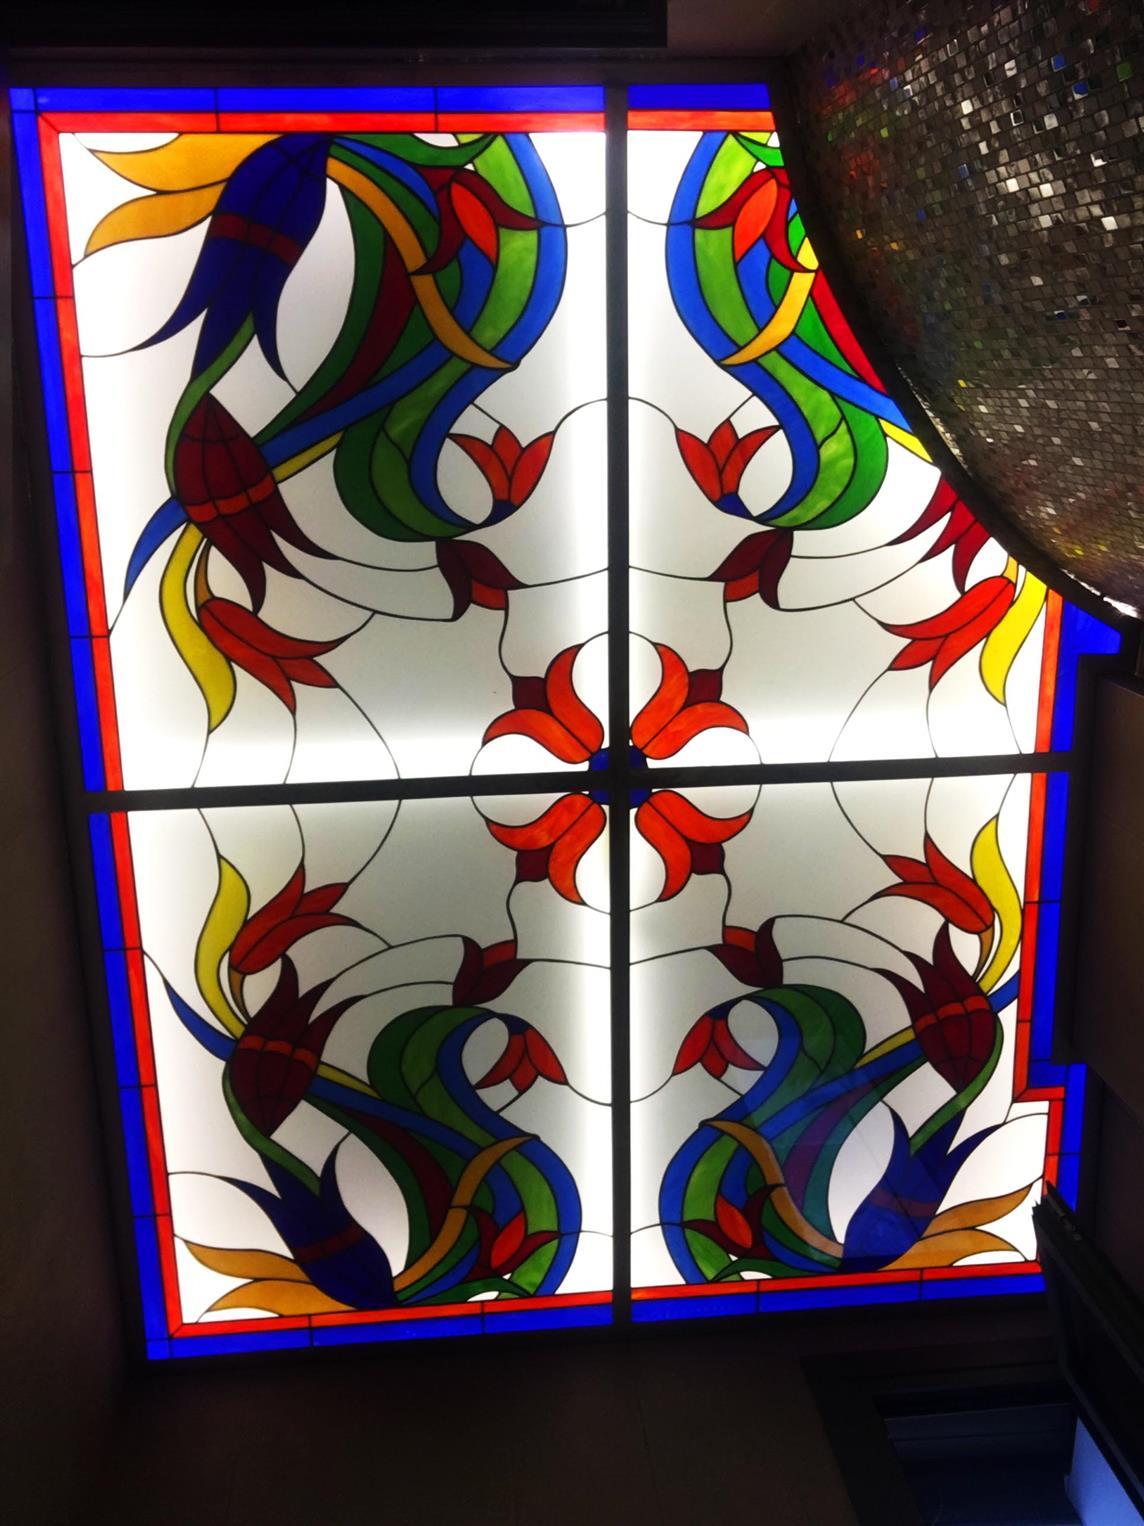 hamam-banyo-tavan-vitraylari20171221185155604.jpg izmir vitray çalışması